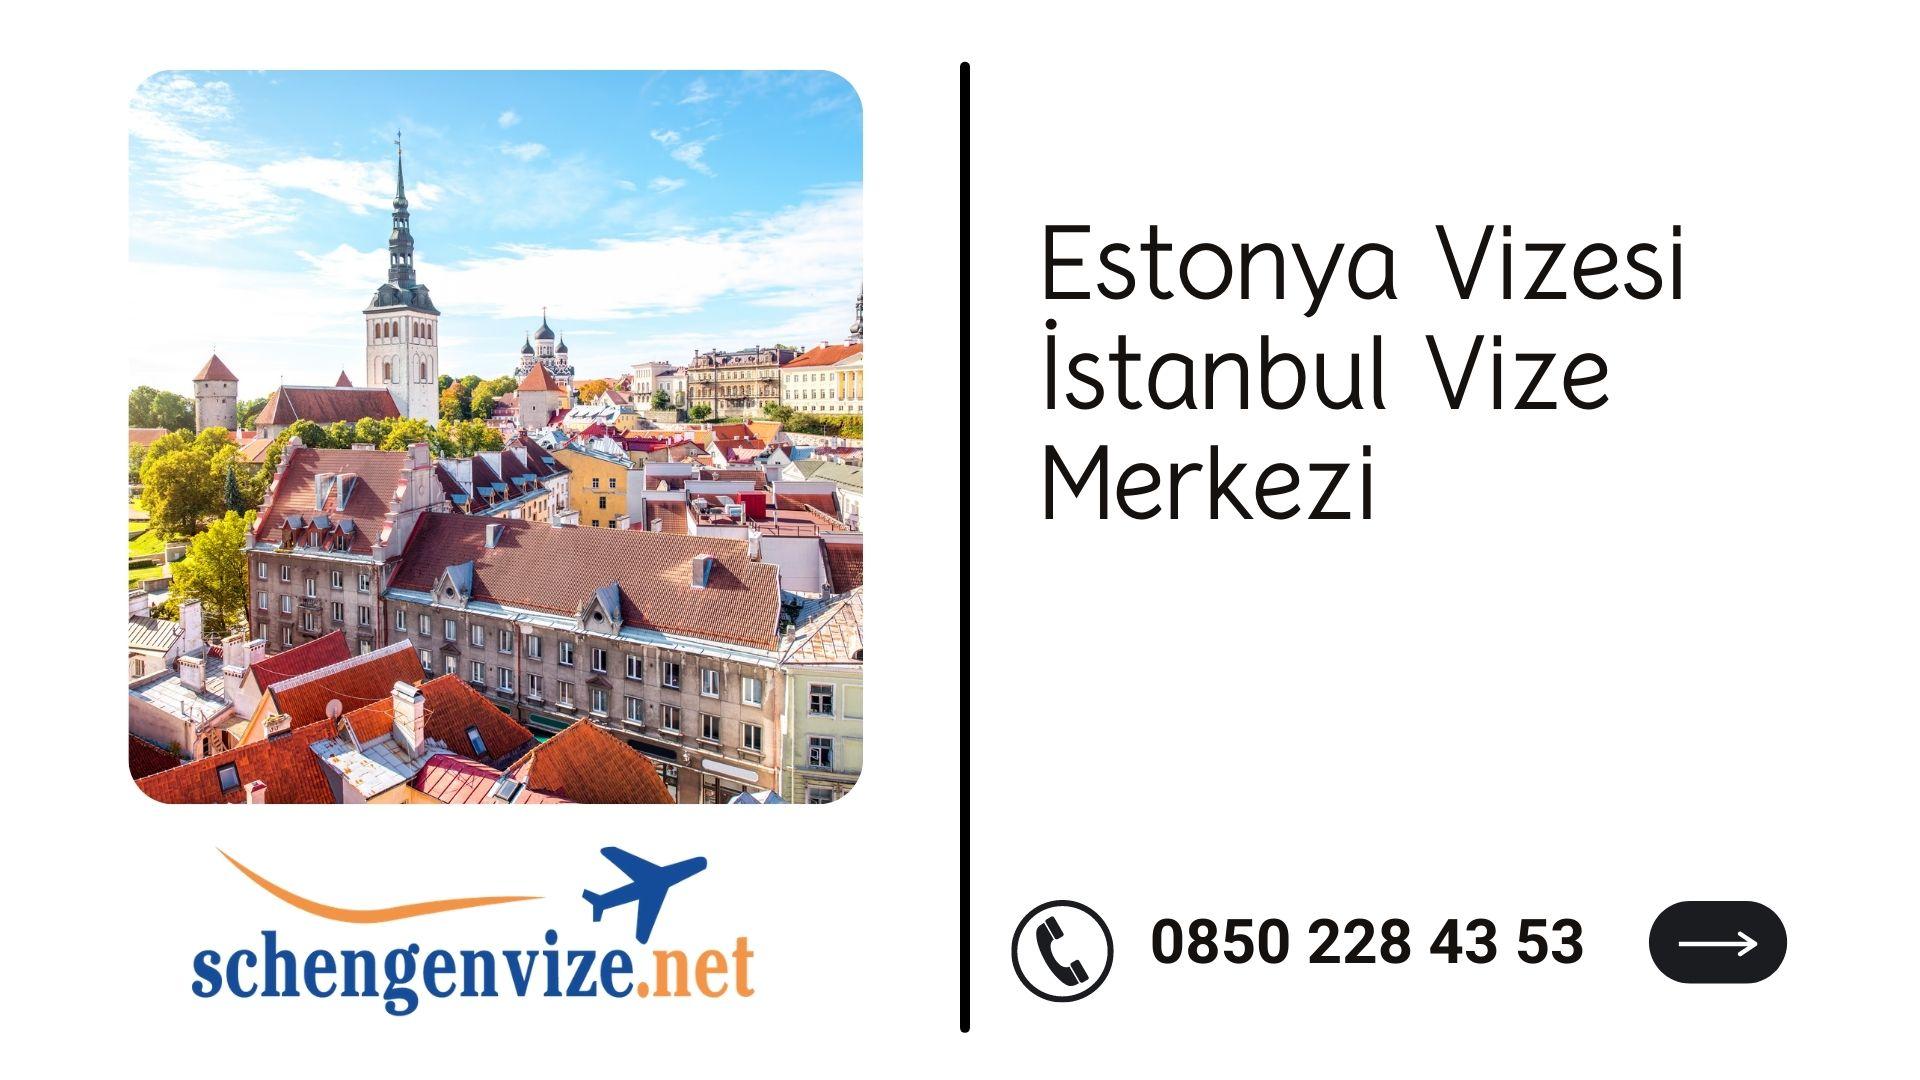 Estonya Vizesi İstanbul Vize Merkezi